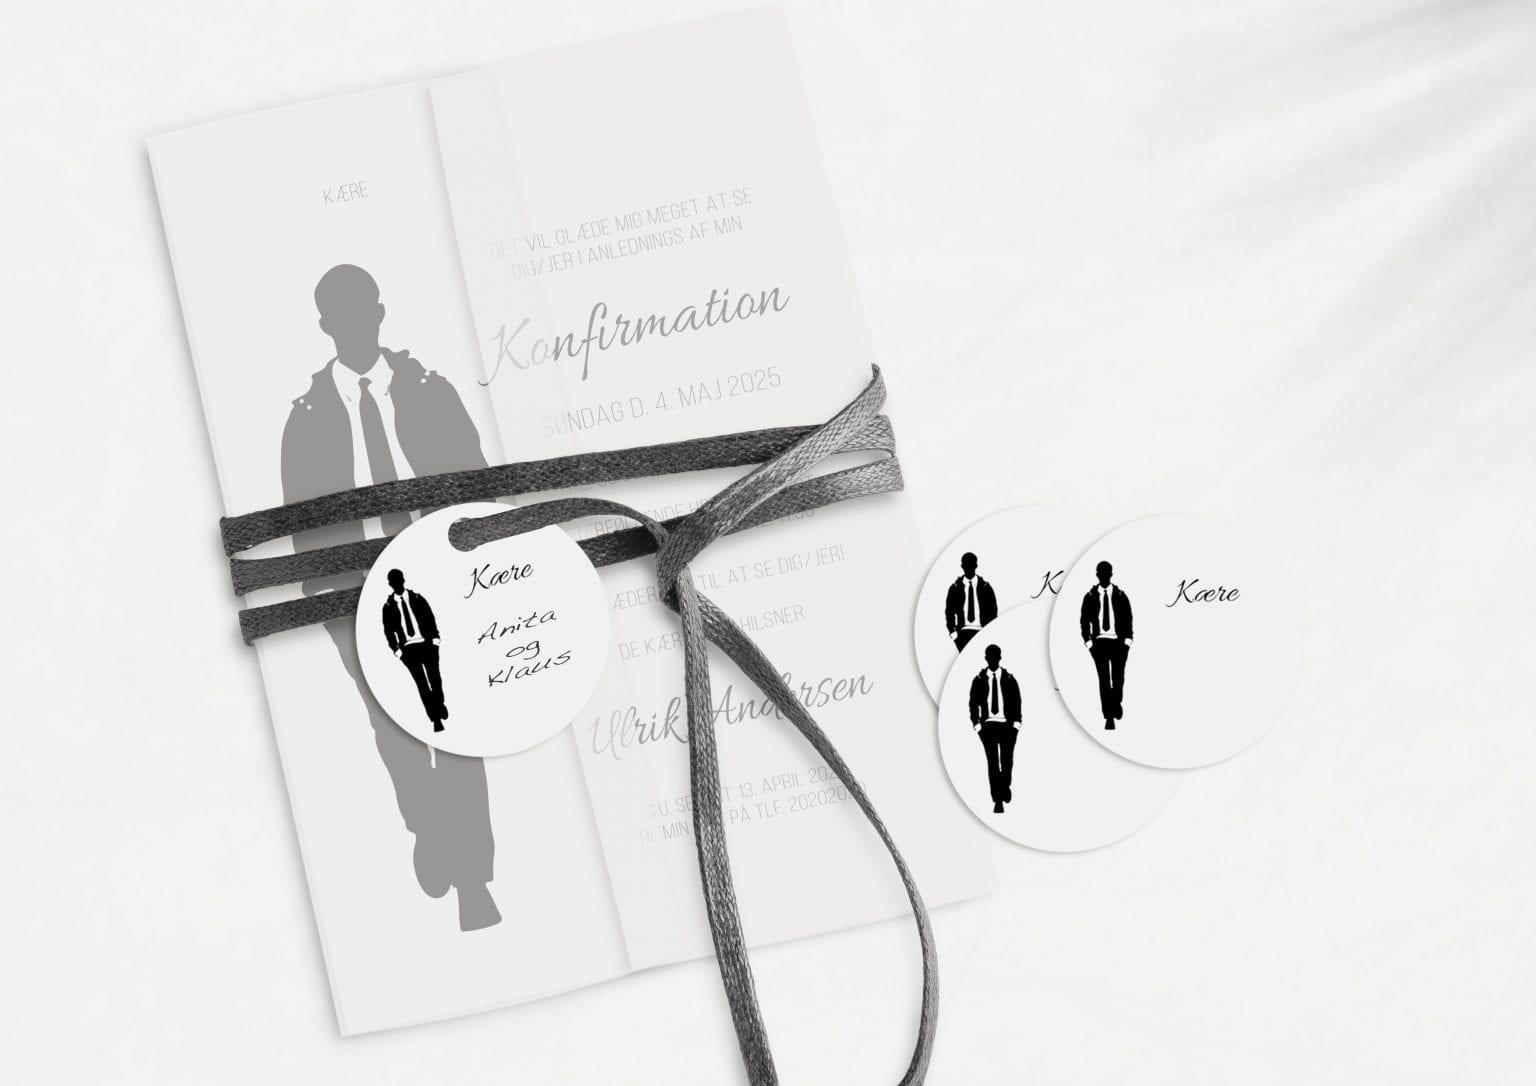 Silhuette Suit, manillamærke, konfirmation